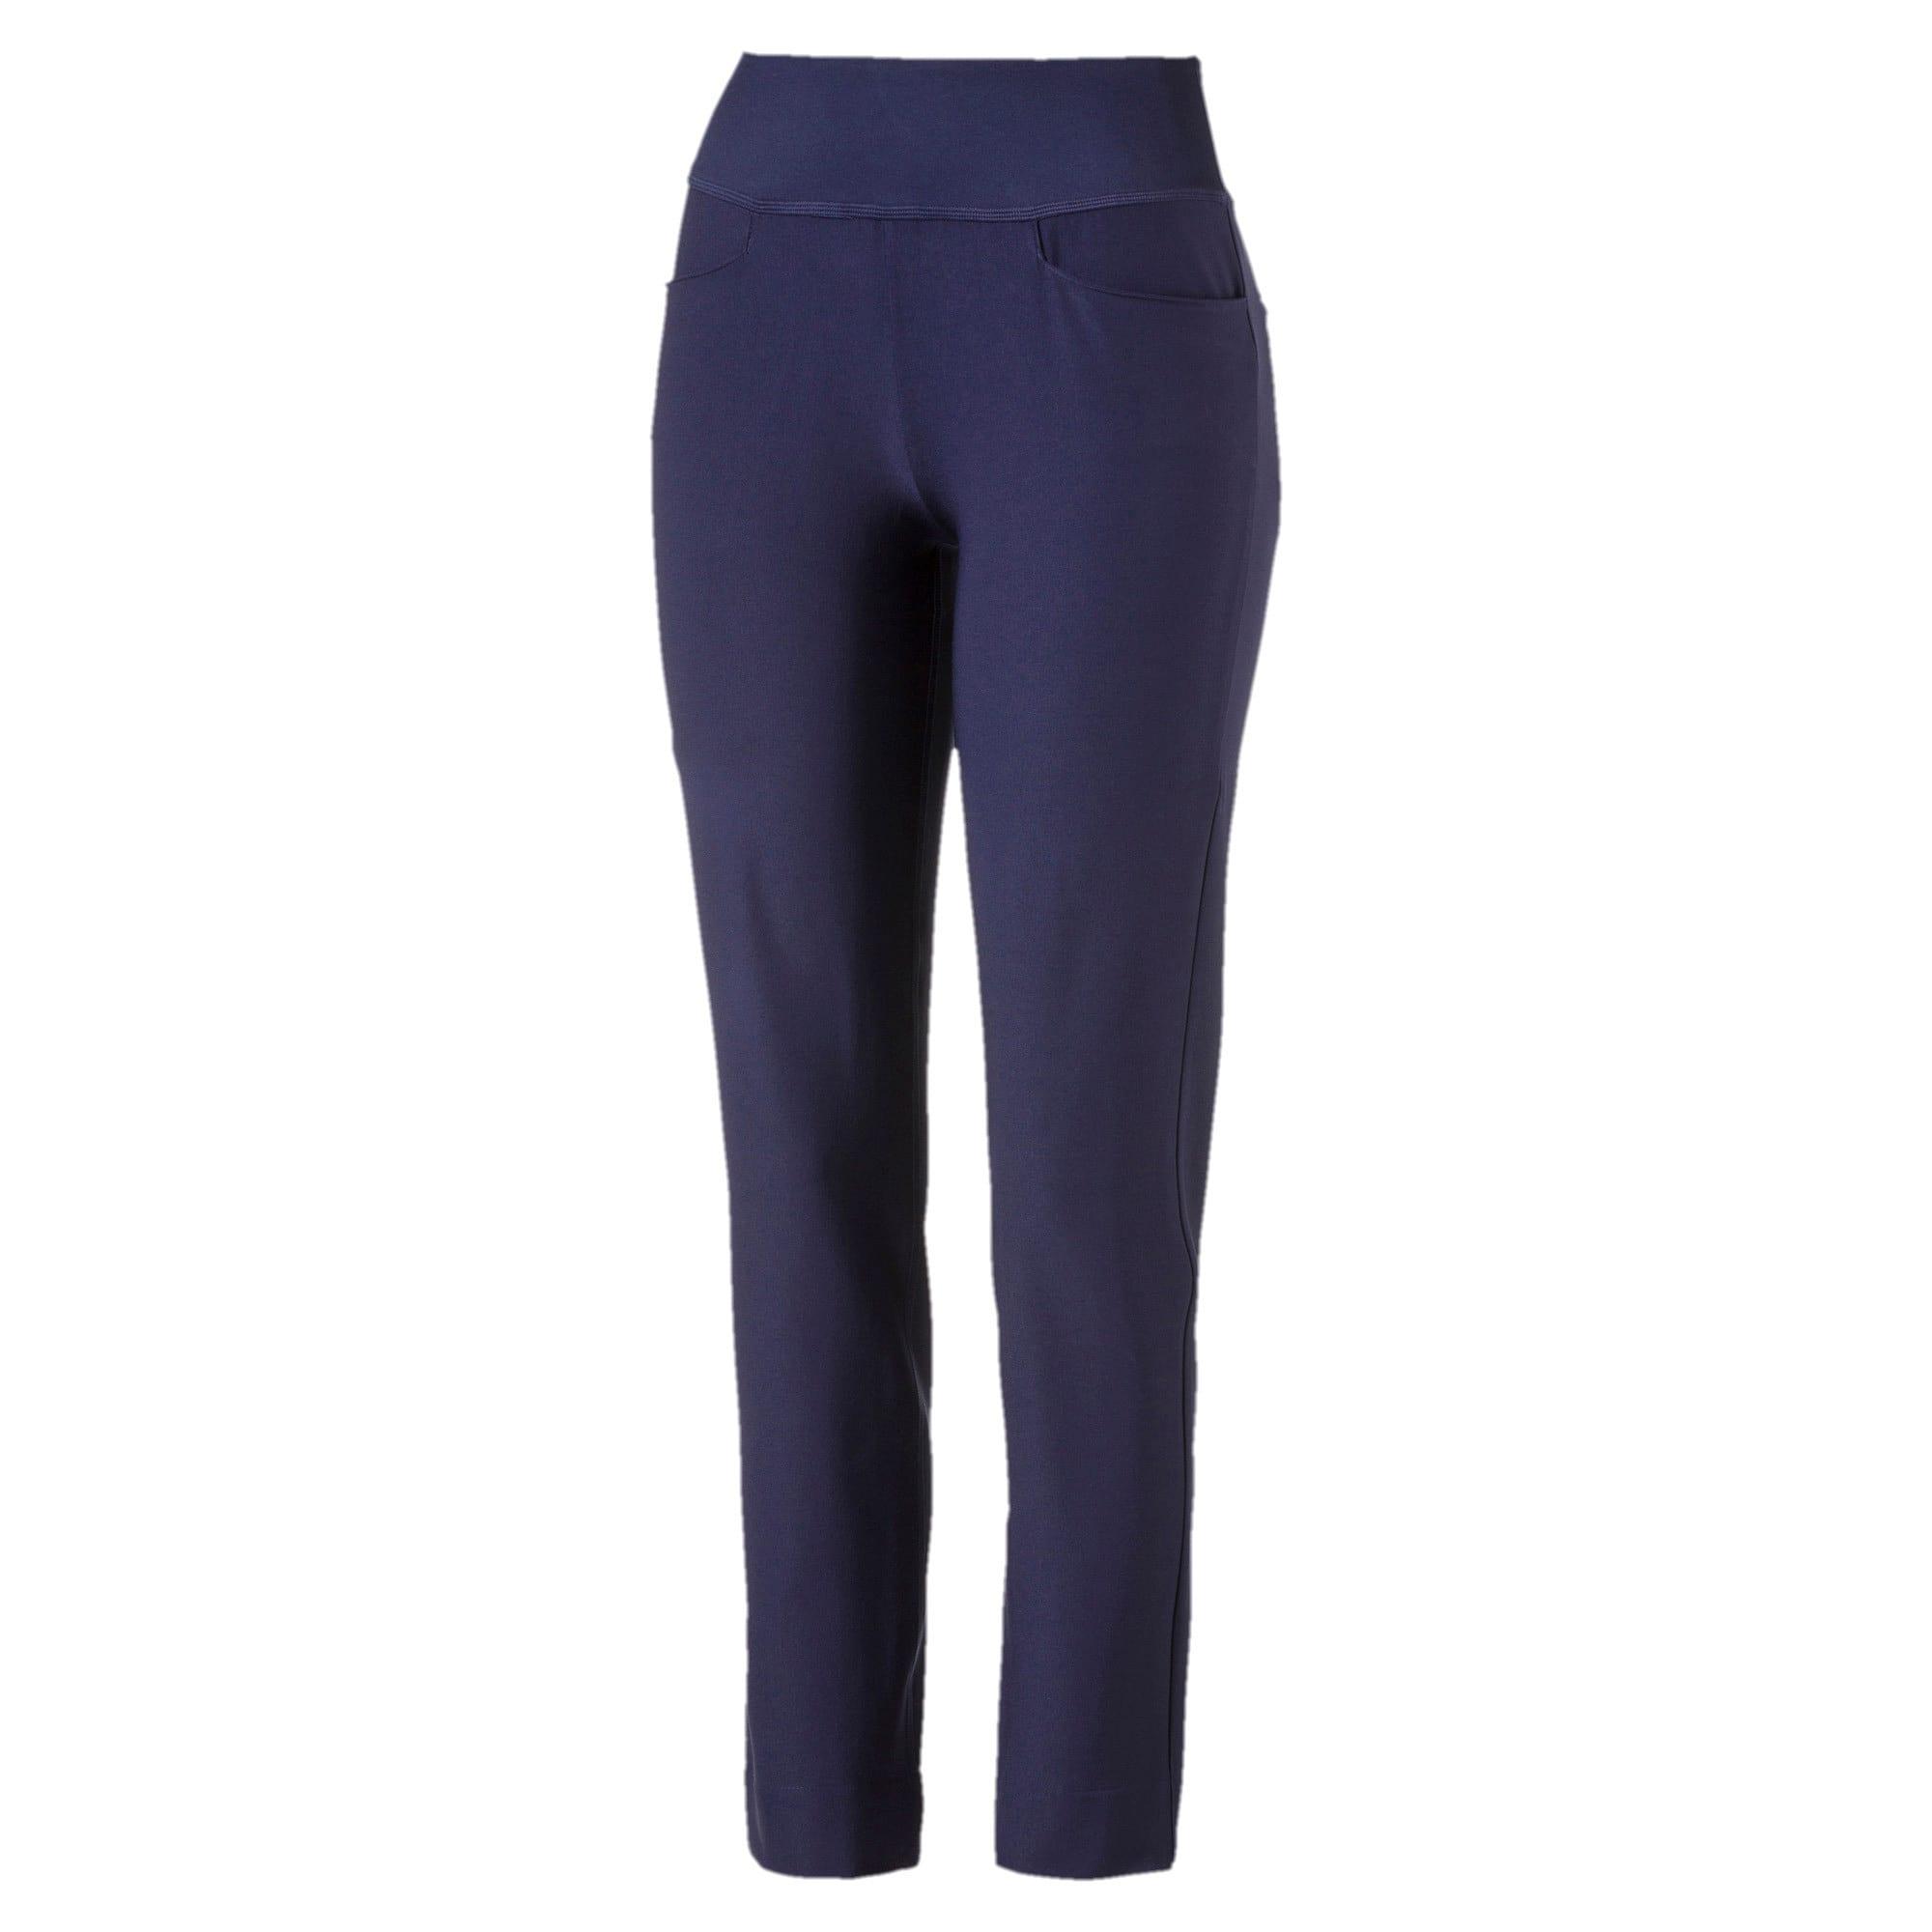 Thumbnail 4 of Golf Women's PWRSHAPE Pull On Pants, Peacoat, medium